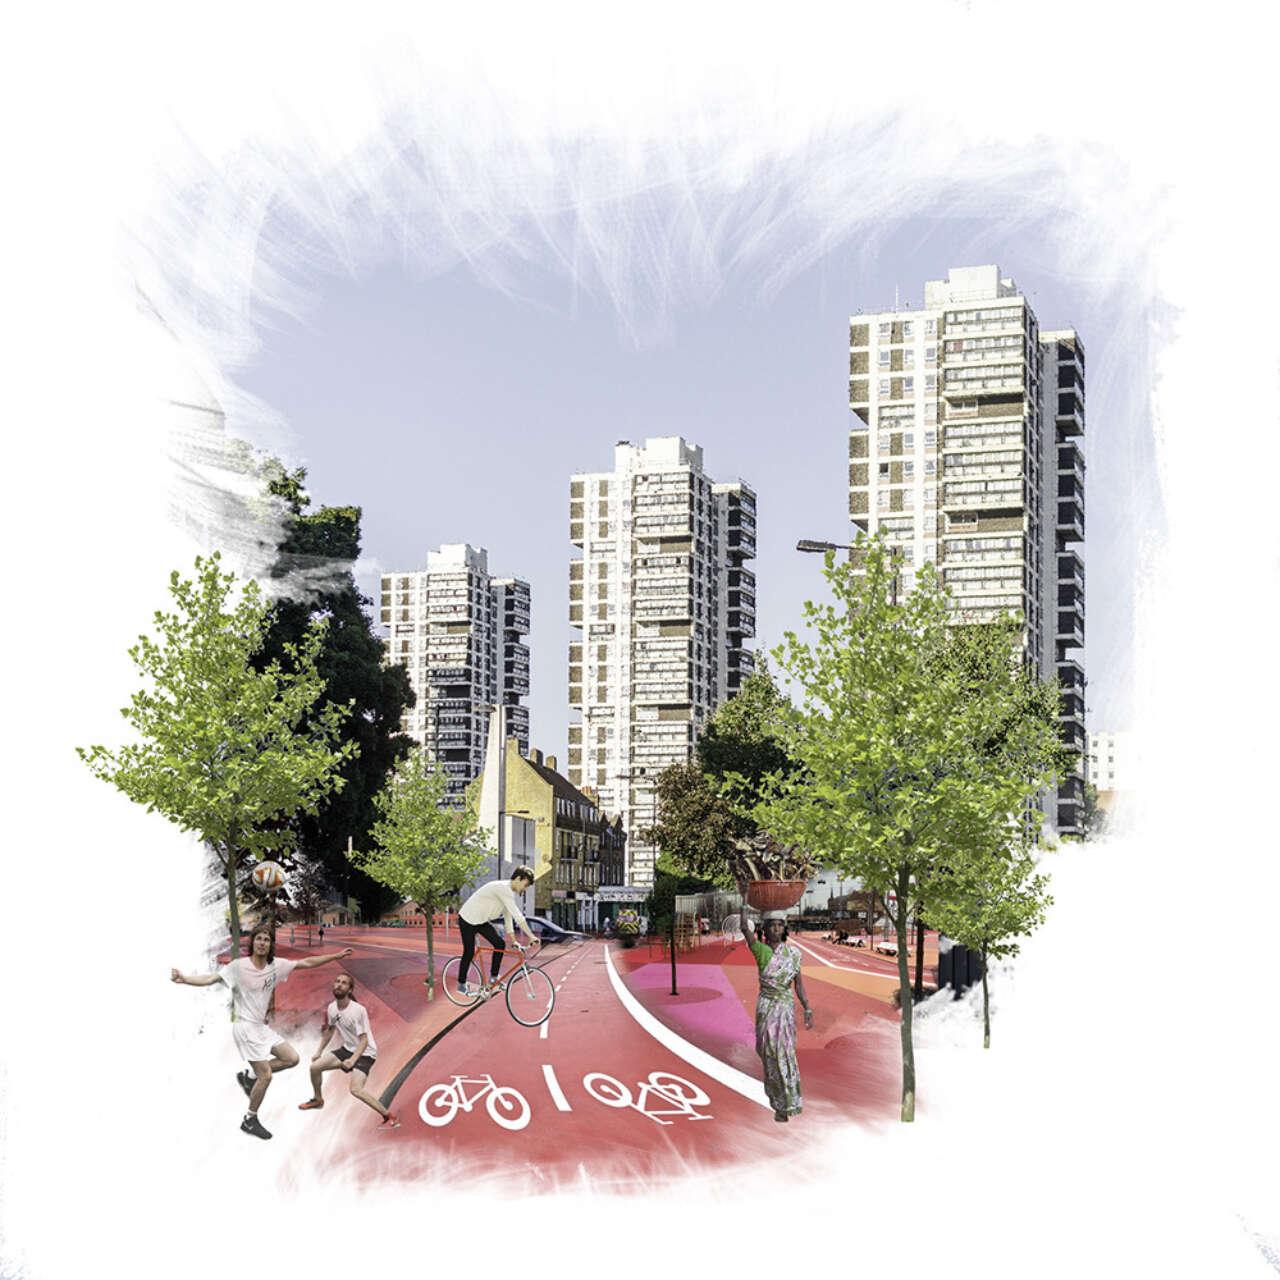 London Festival of Architecture 2020